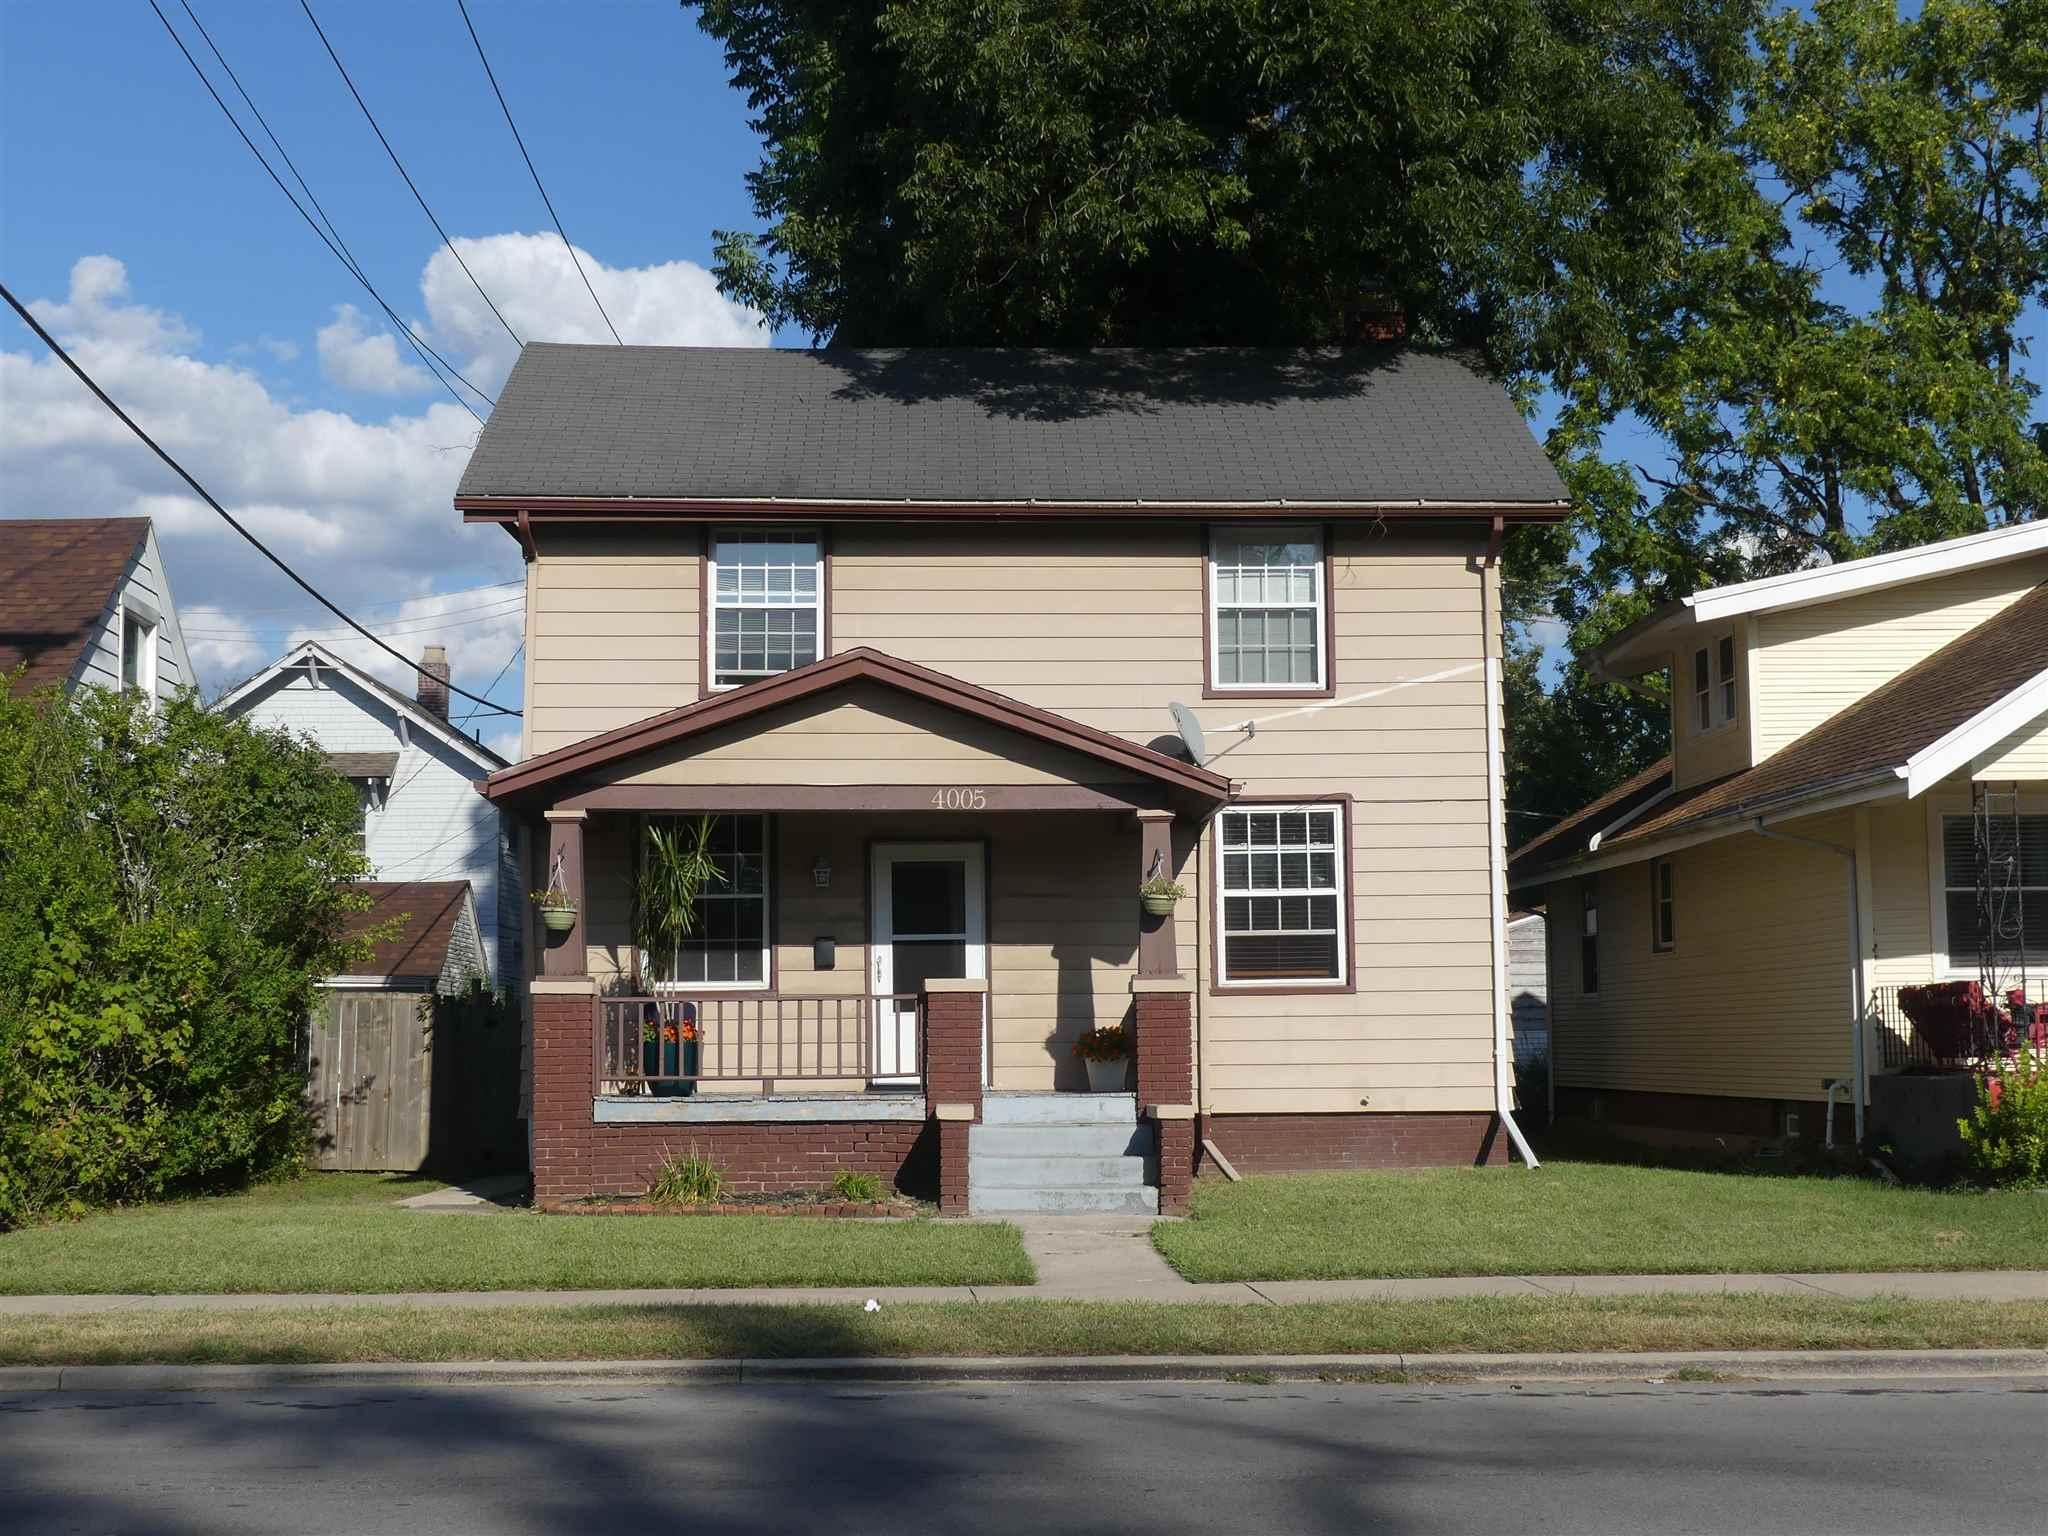 4005 S Calhoun Street, Fort Wayne, IN 46807